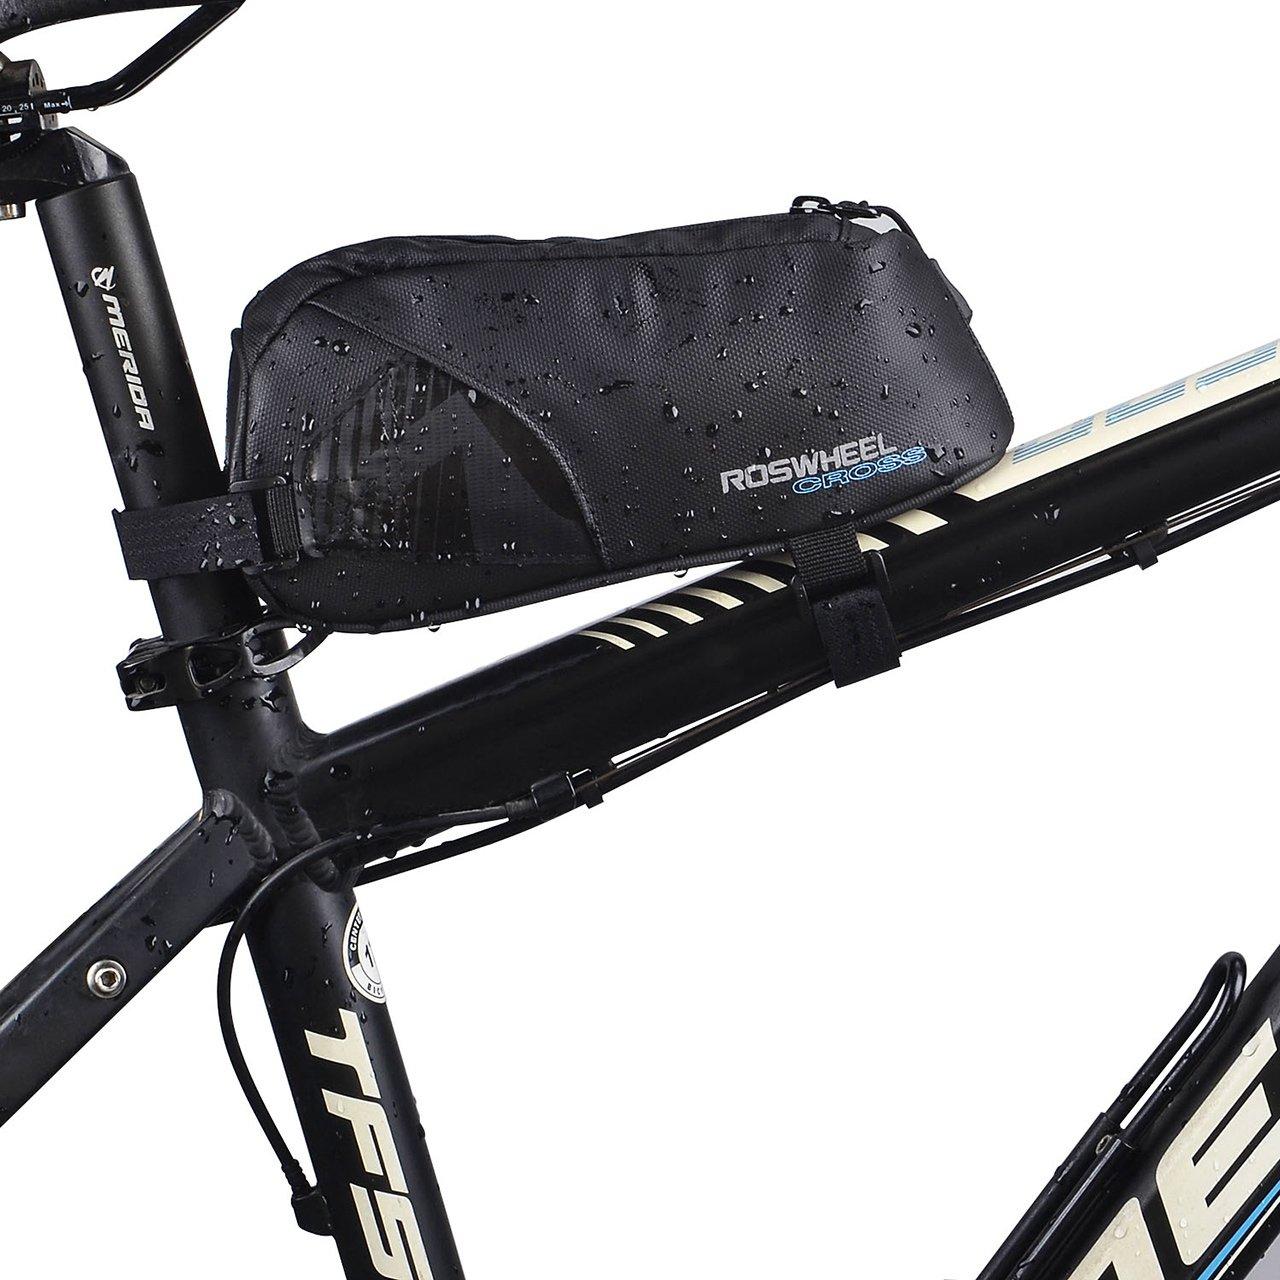 FlexDin Energy Bicycle Frame Bag, MTB/Road Bike Front/Back Top Tube Cycling Fuel Bag Pannier Waterproof 1680D 0.9L Black